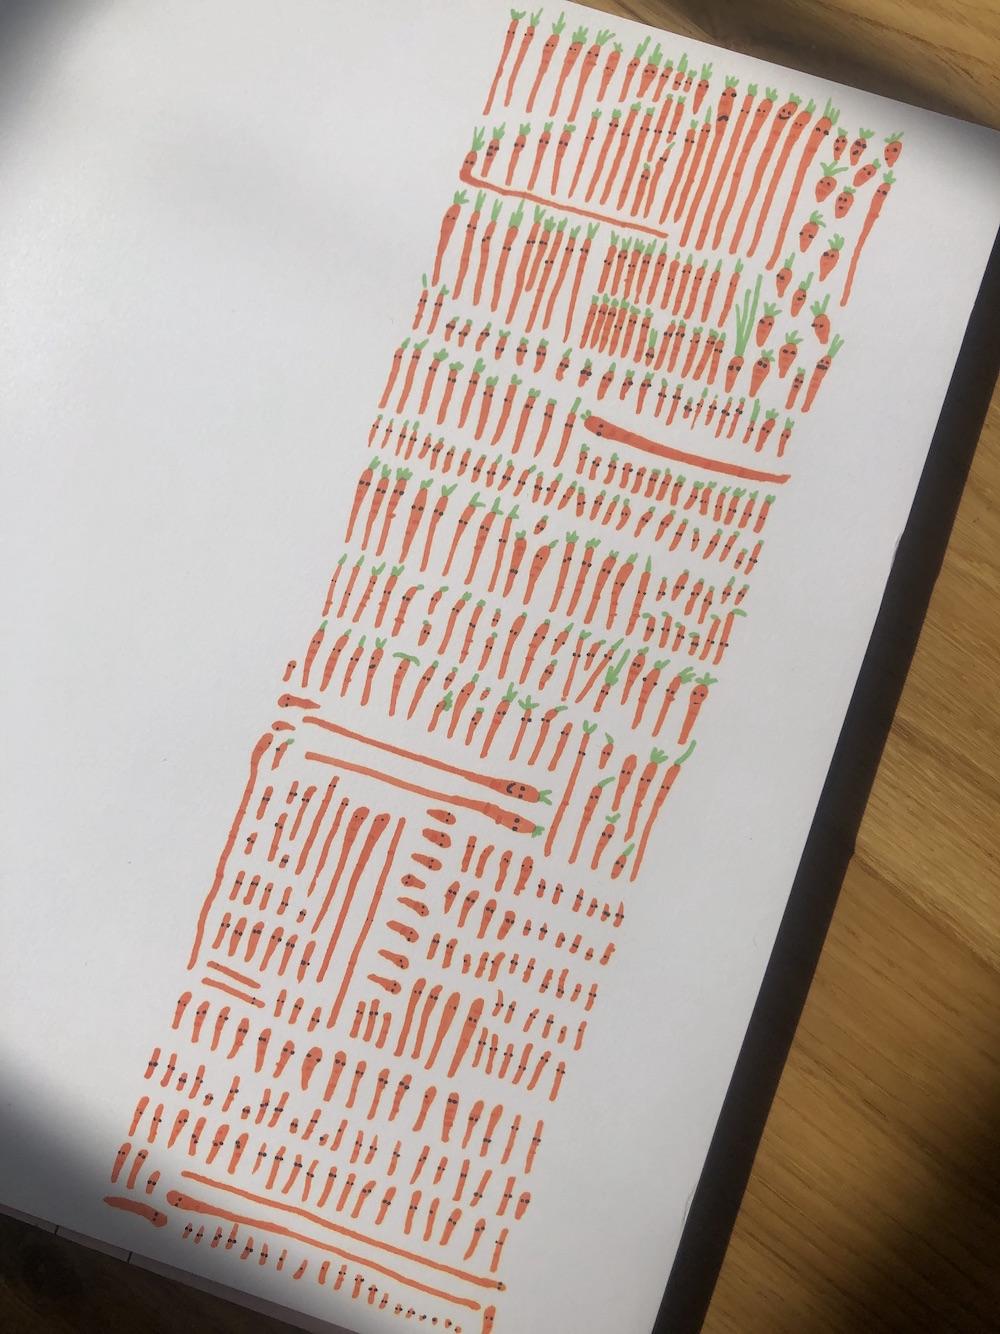 Carrots - John-Luke Roberts